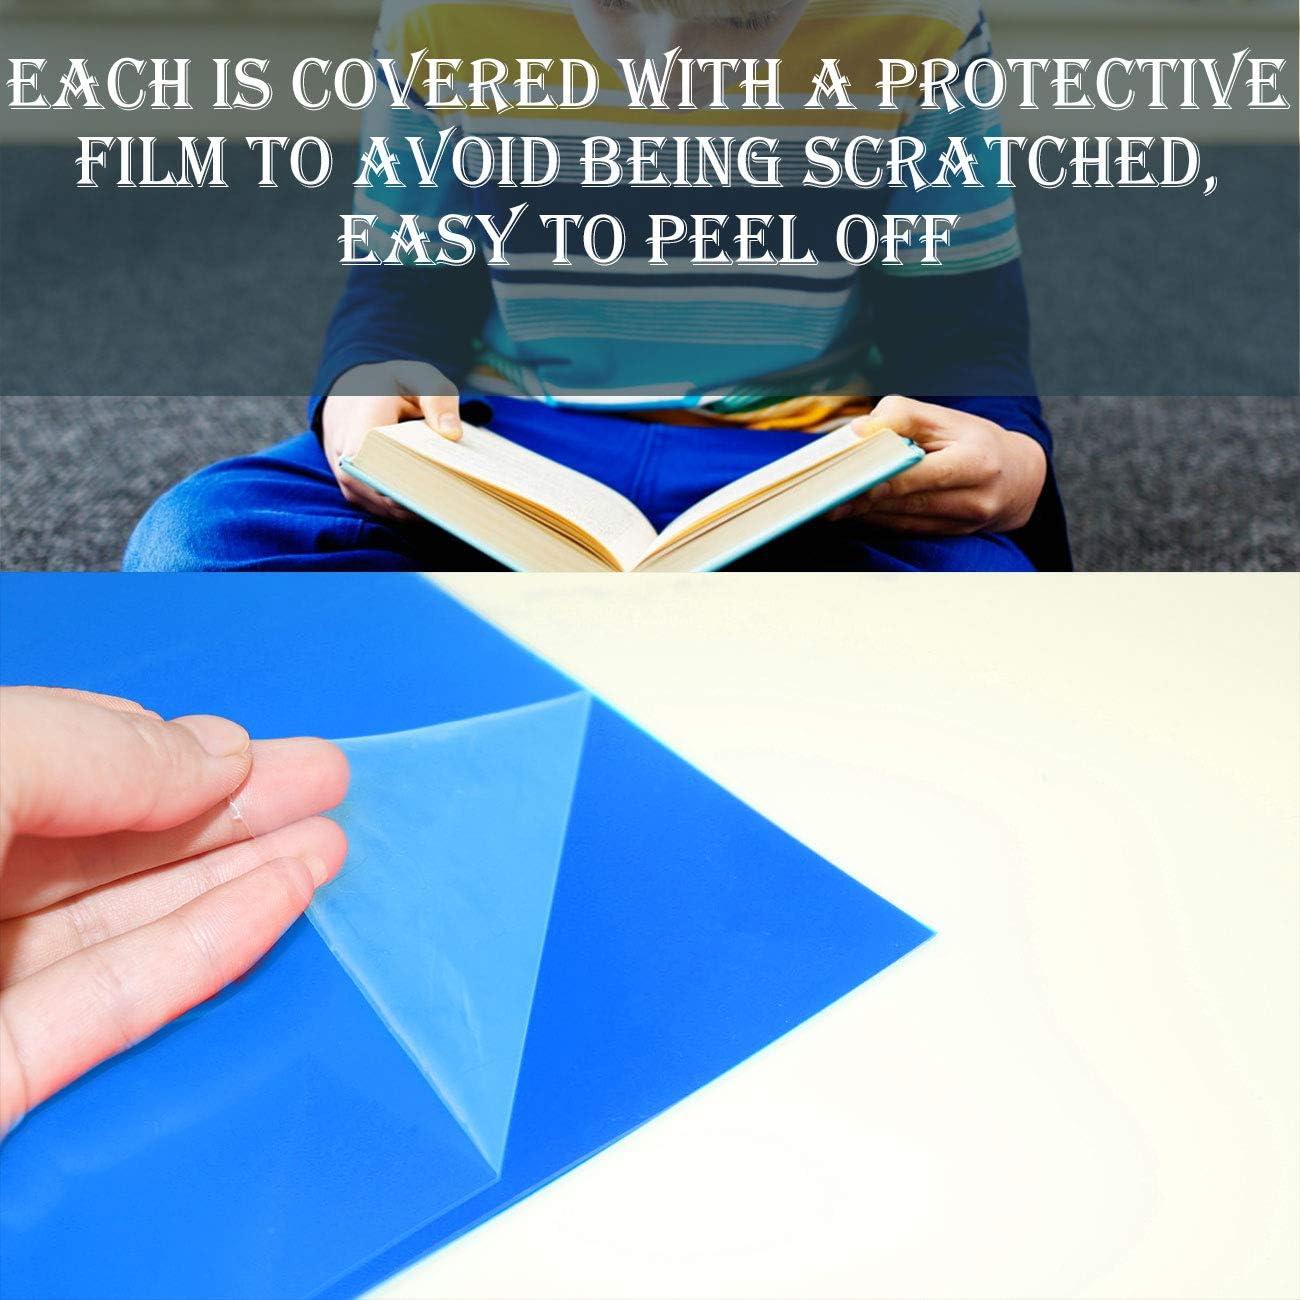 Gel Light Filter Plastic Sheet 8.5 x 11-Inches SAKOLLA 10 Pieces Transparent Blue Correction Lighting Gel Filter